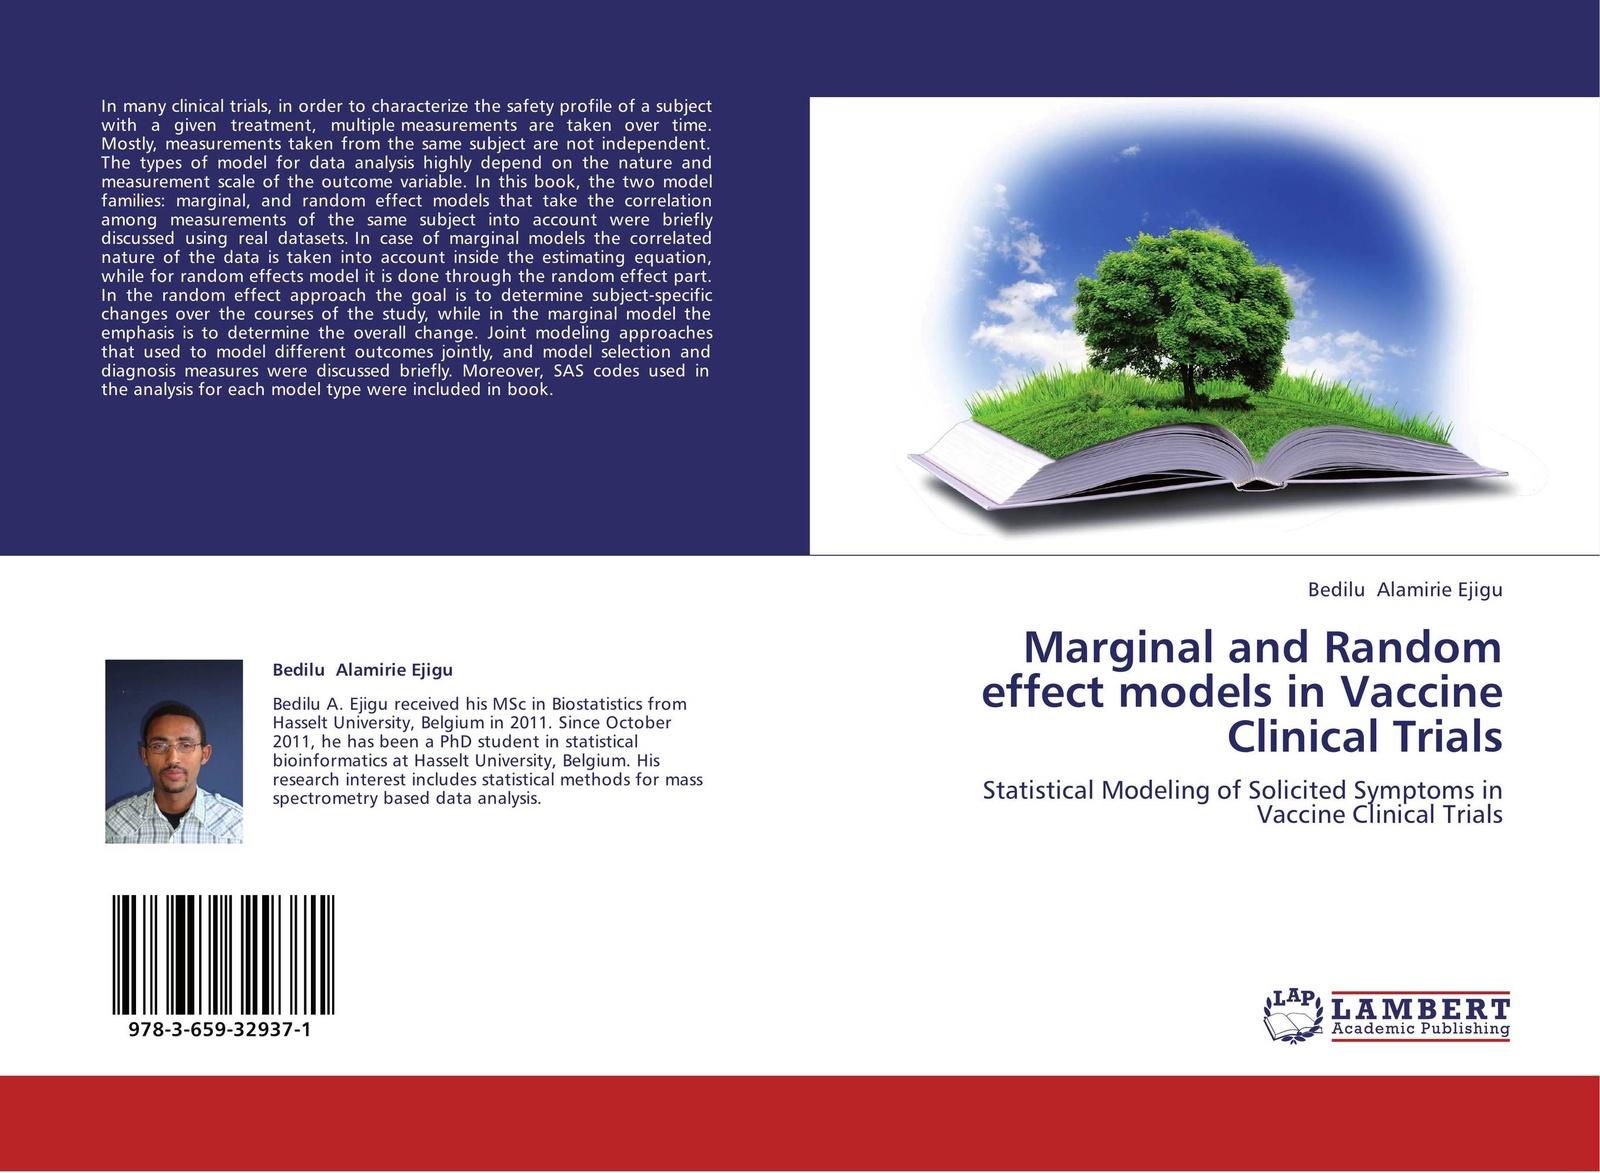 Bedilu Alamirie Ejigu Marginal and Random effect models in Vaccine Clinical Trials bendat julius s random data analysis and measurement procedures